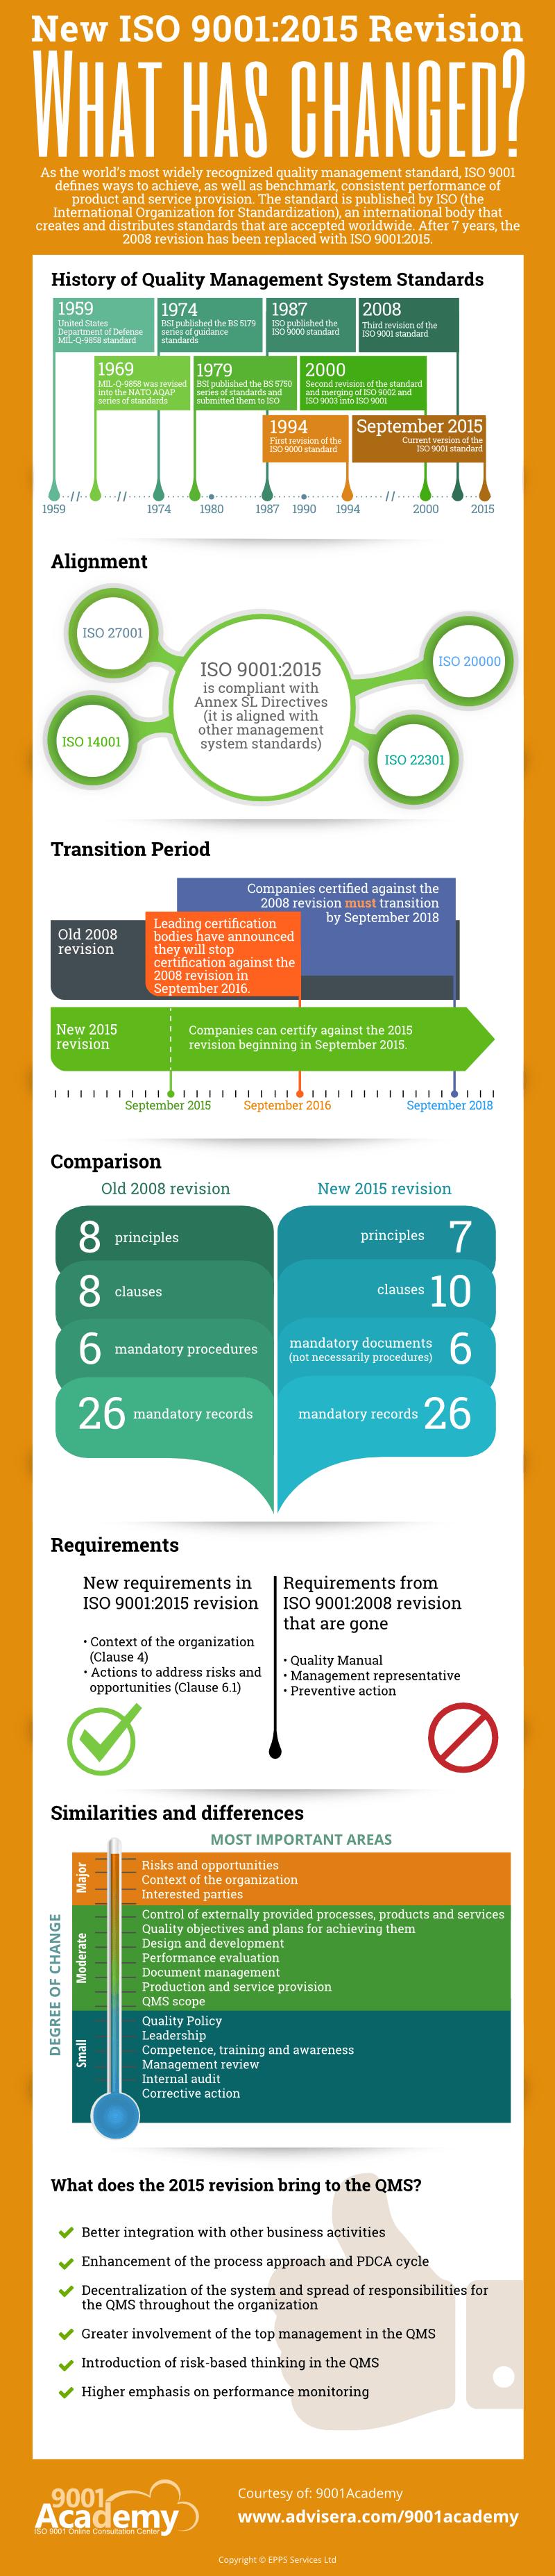 ISO_9001-2015_vs_ISO_9001-2008_Infographic